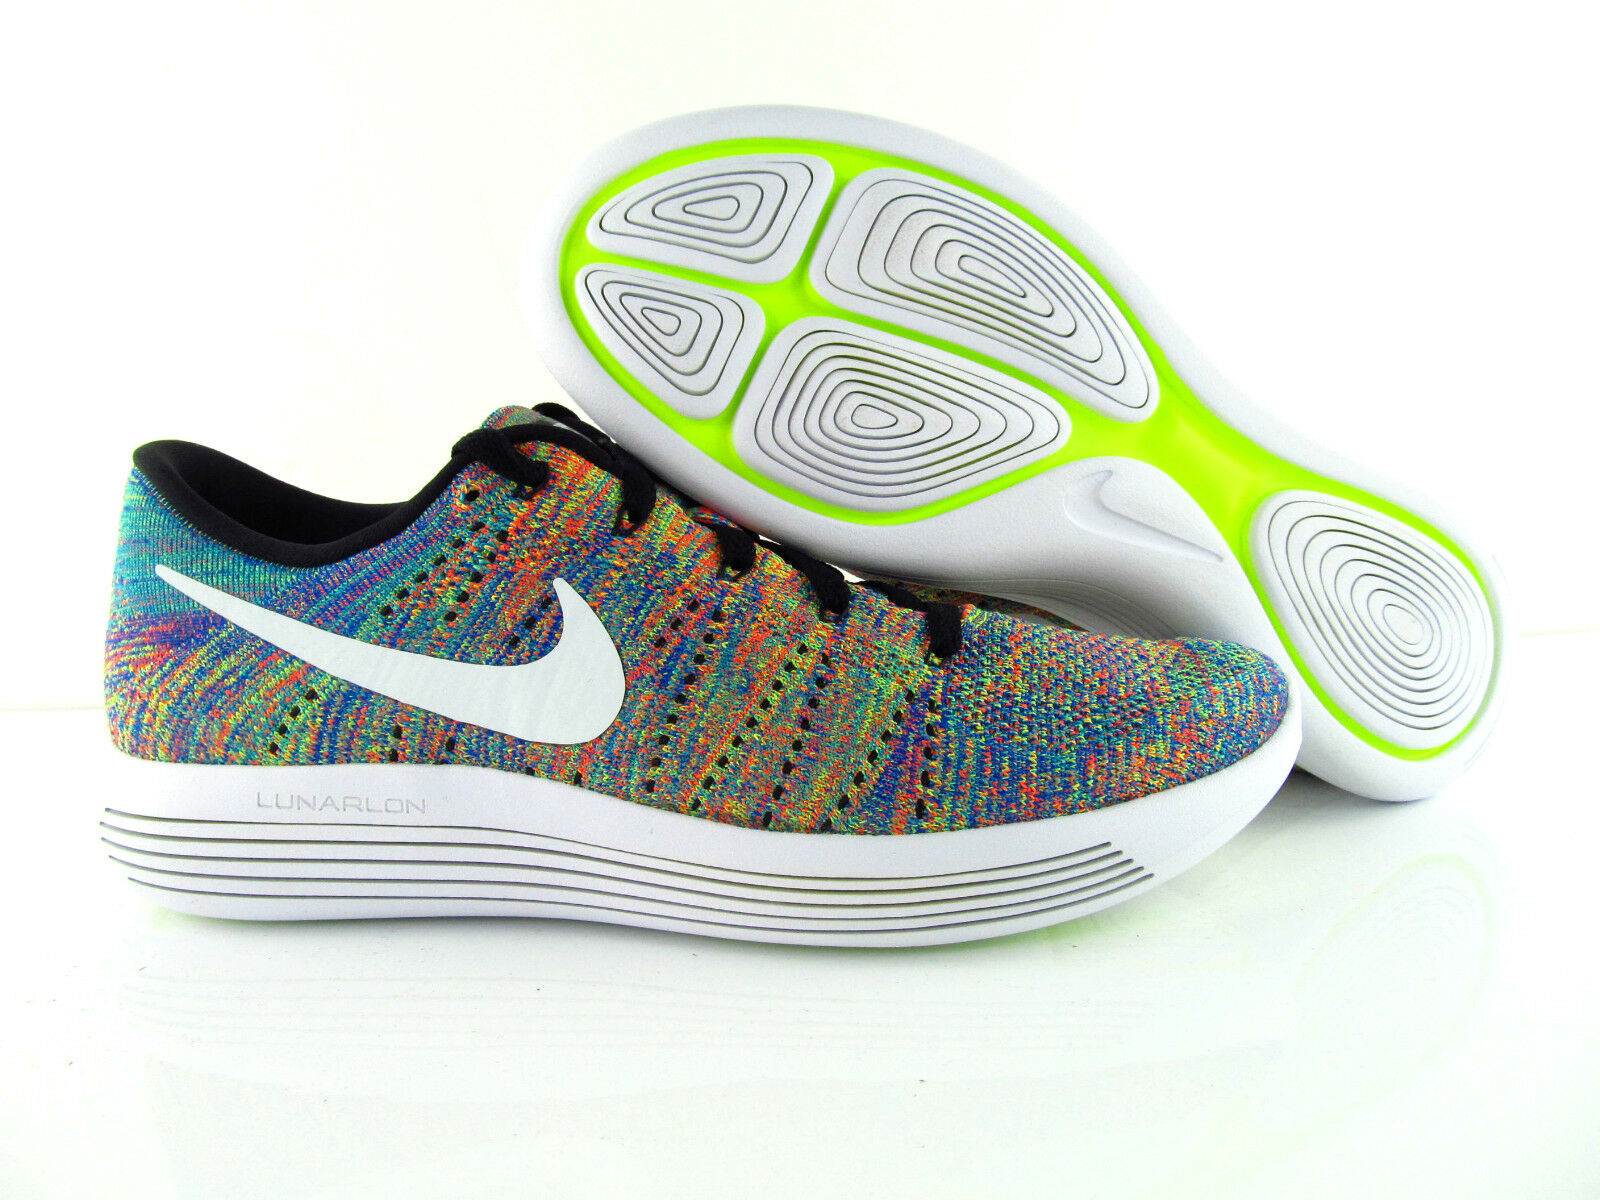 Nike Lunarepic Low UK_6 Flyknit Multicolor Running Us_7 UK_6 Low  Eur_40 207759